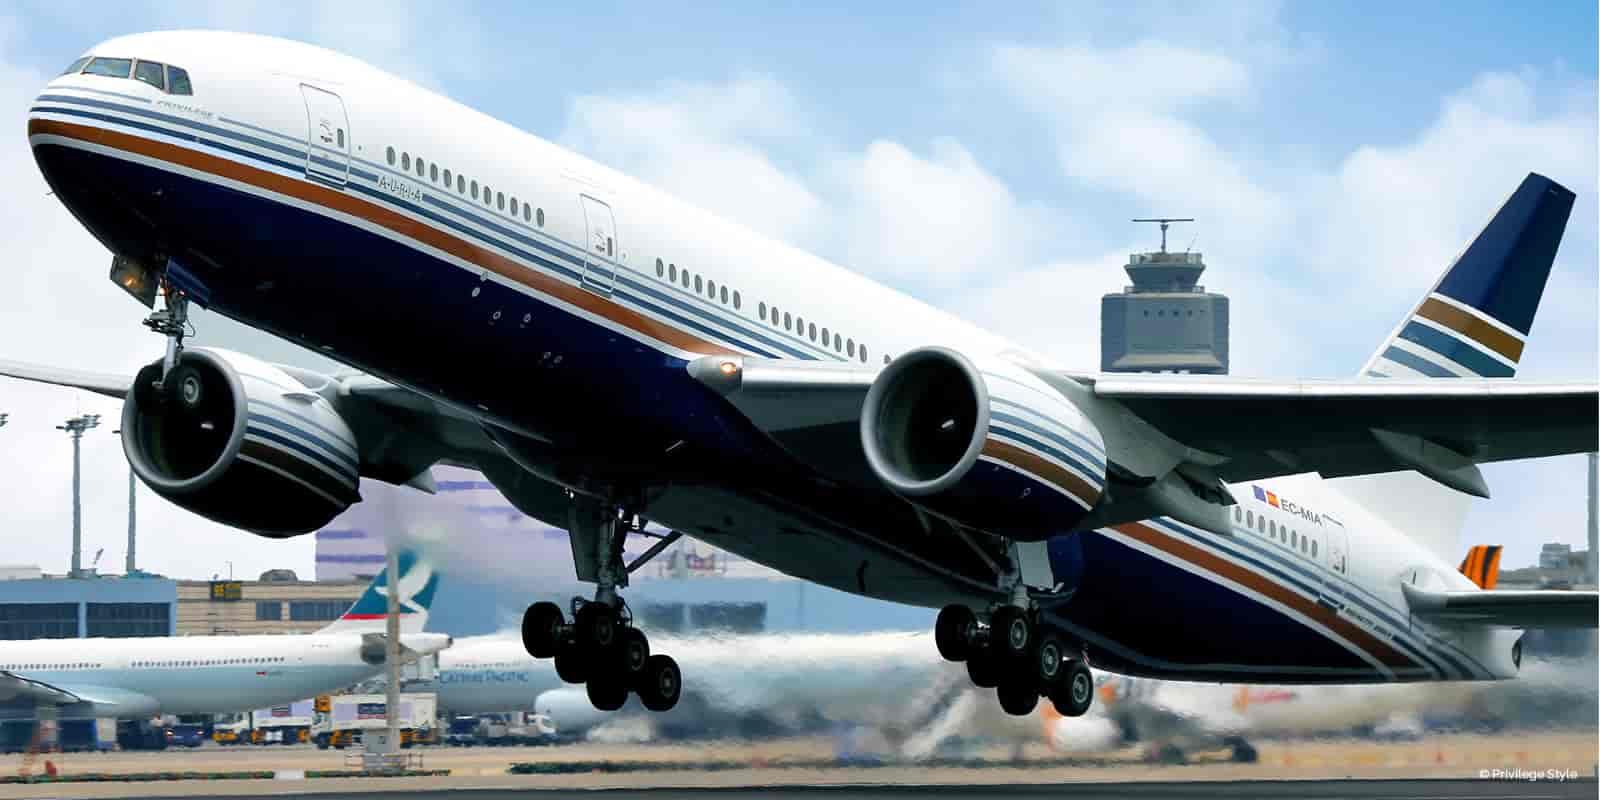 private flights emptyleg